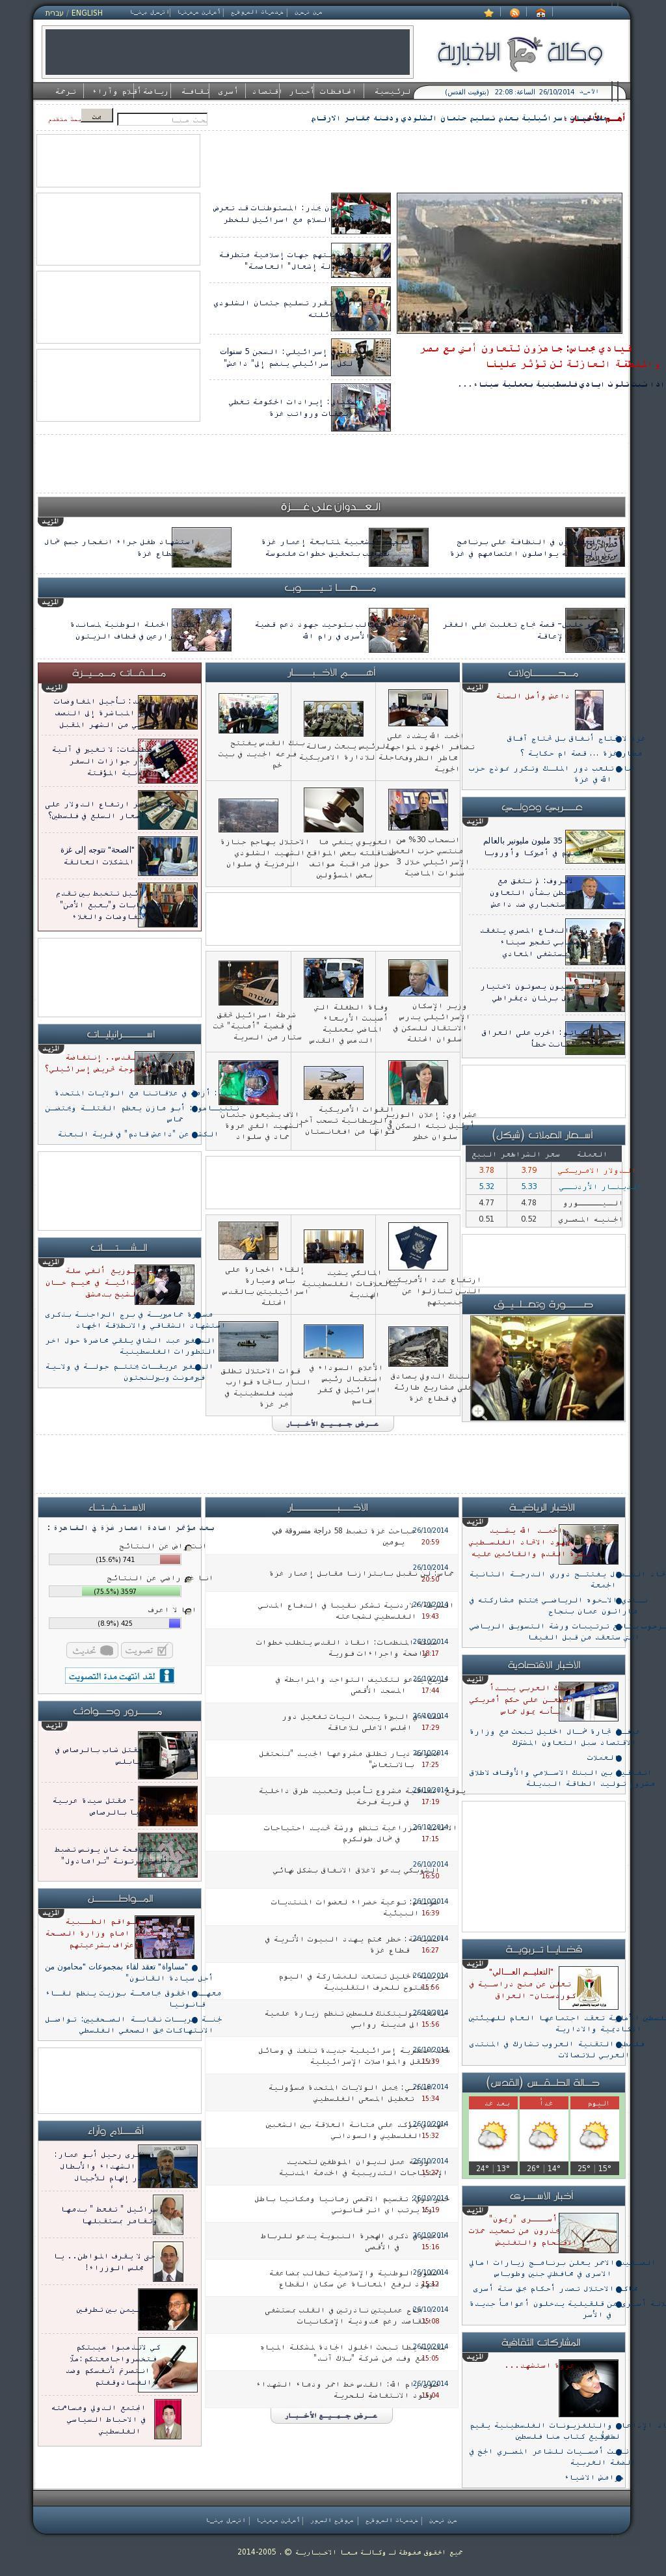 Ma'an News at Sunday Oct. 26, 2014, 8:08 p.m. UTC